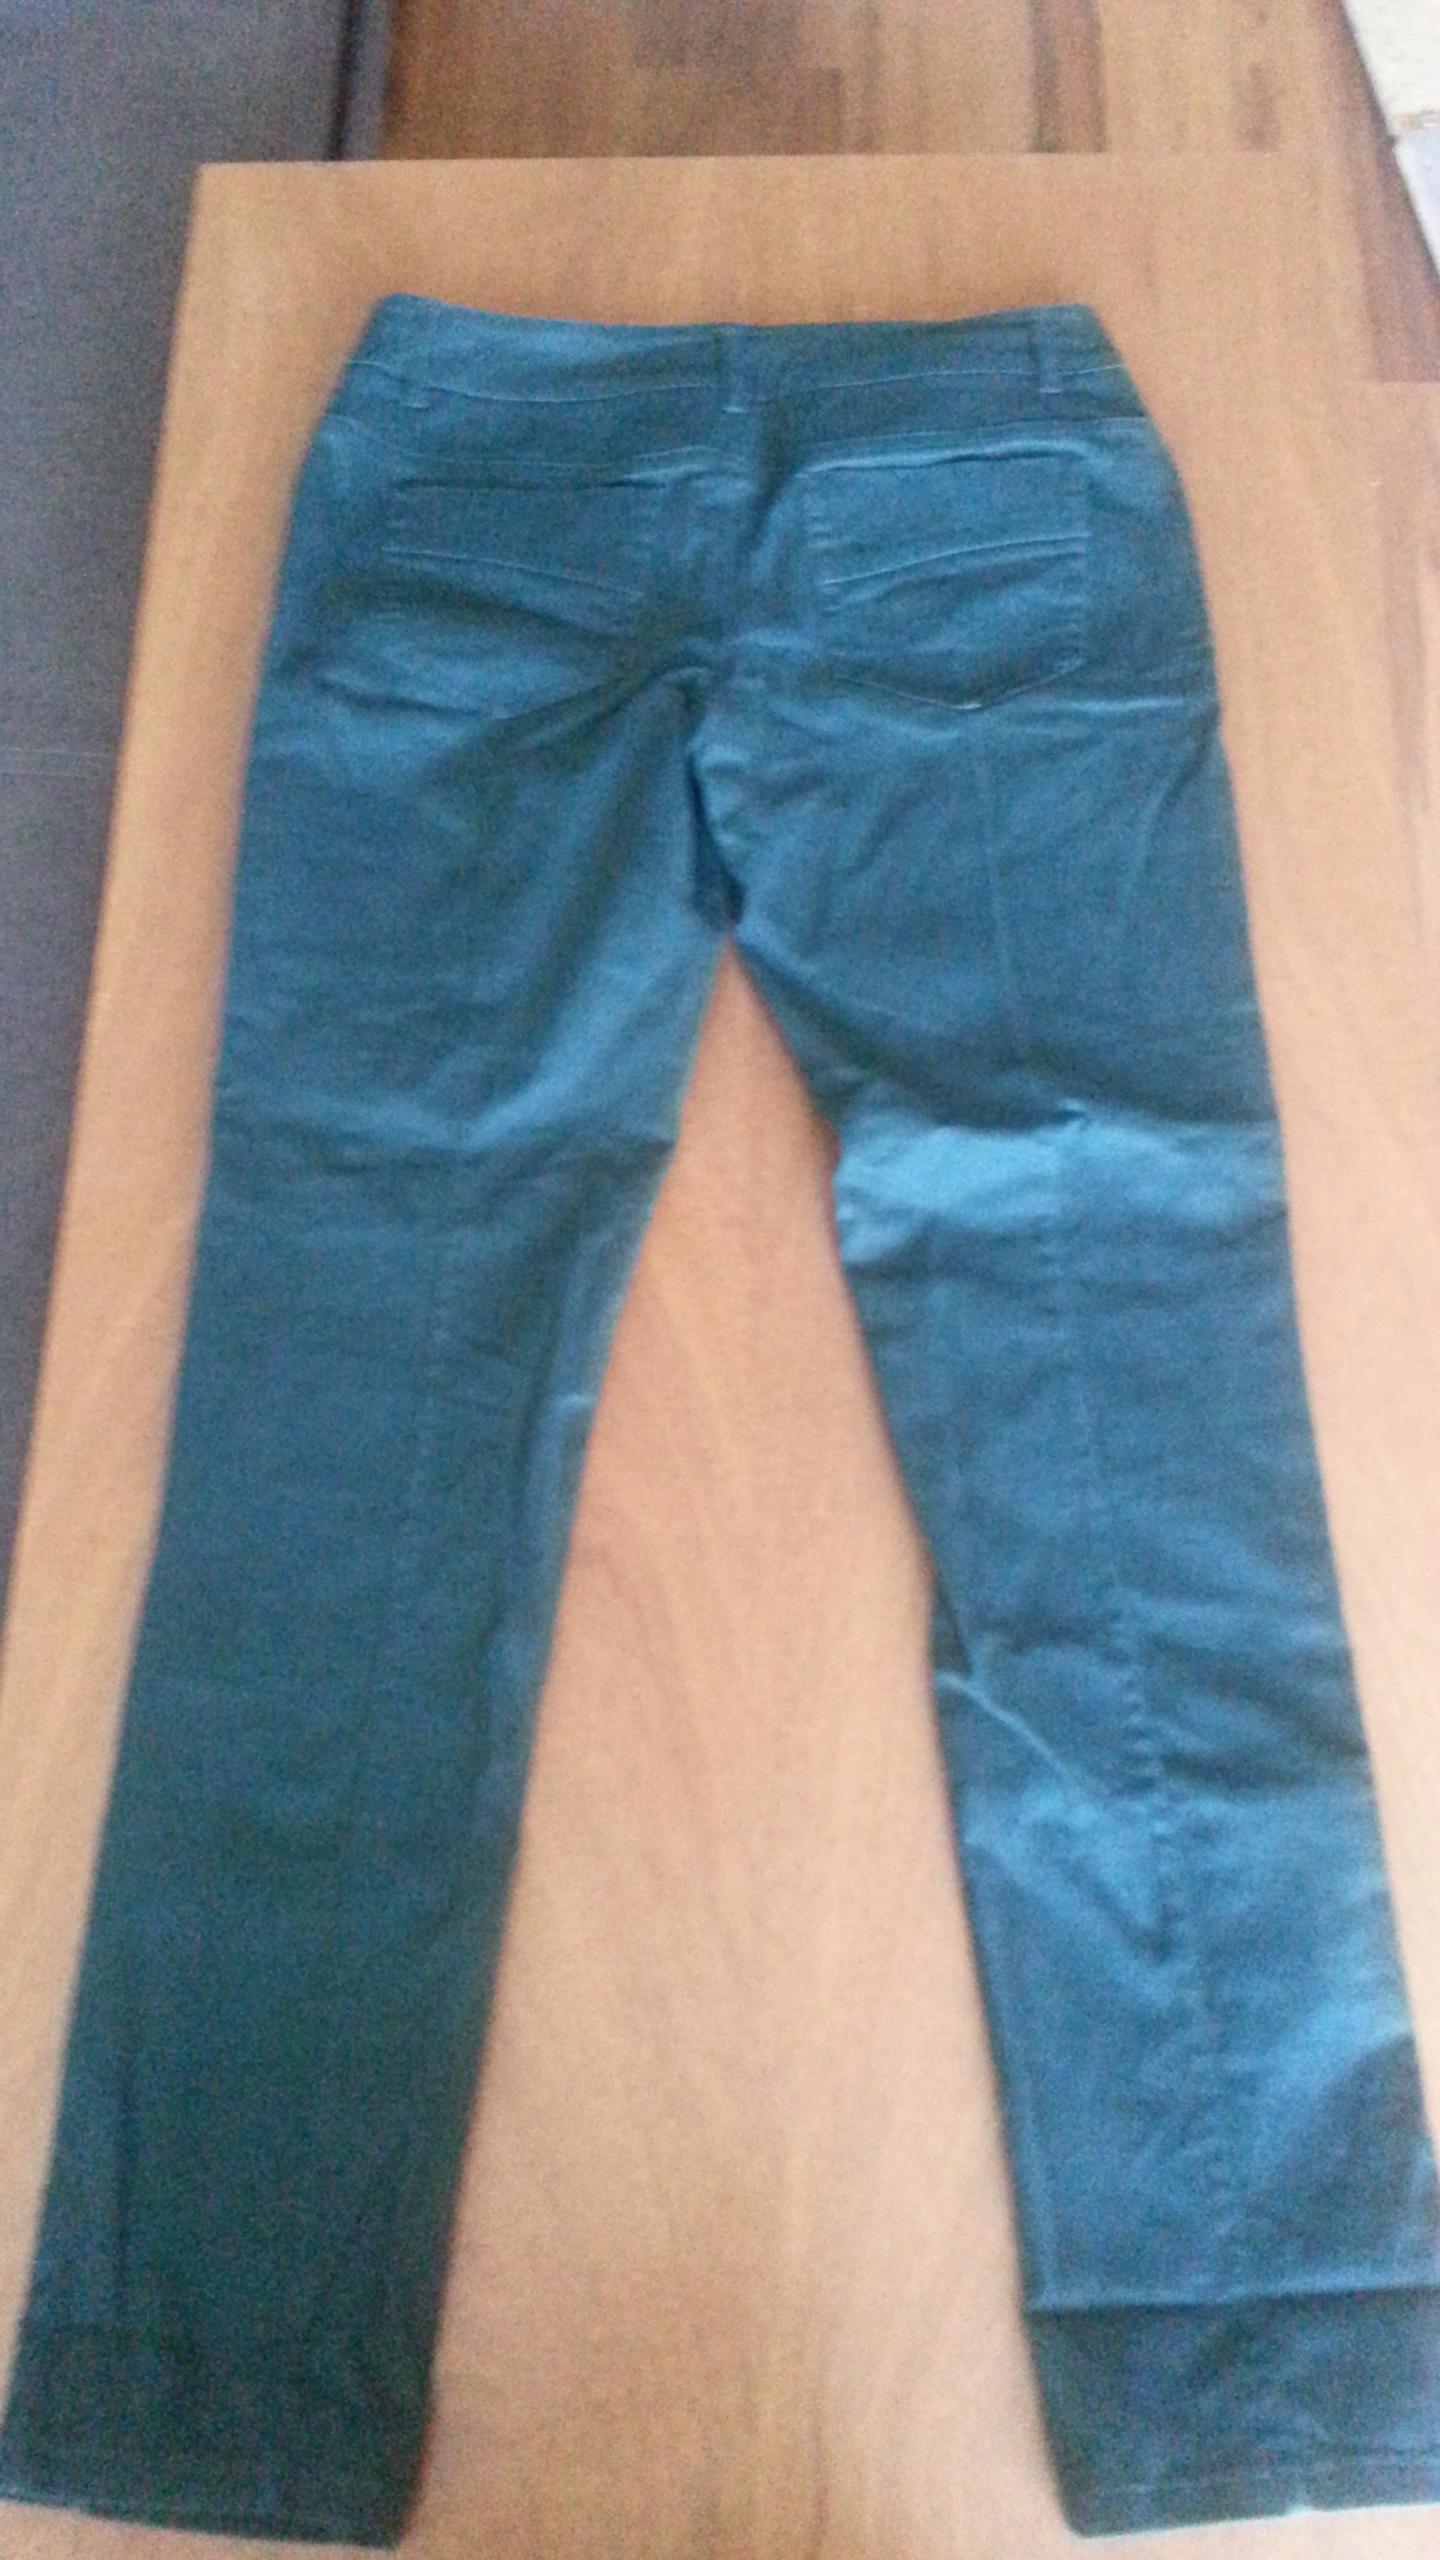 e8f0822fb4d59 Spodnie zielone orsay - 7520560579 - oficjalne archiwum allegro